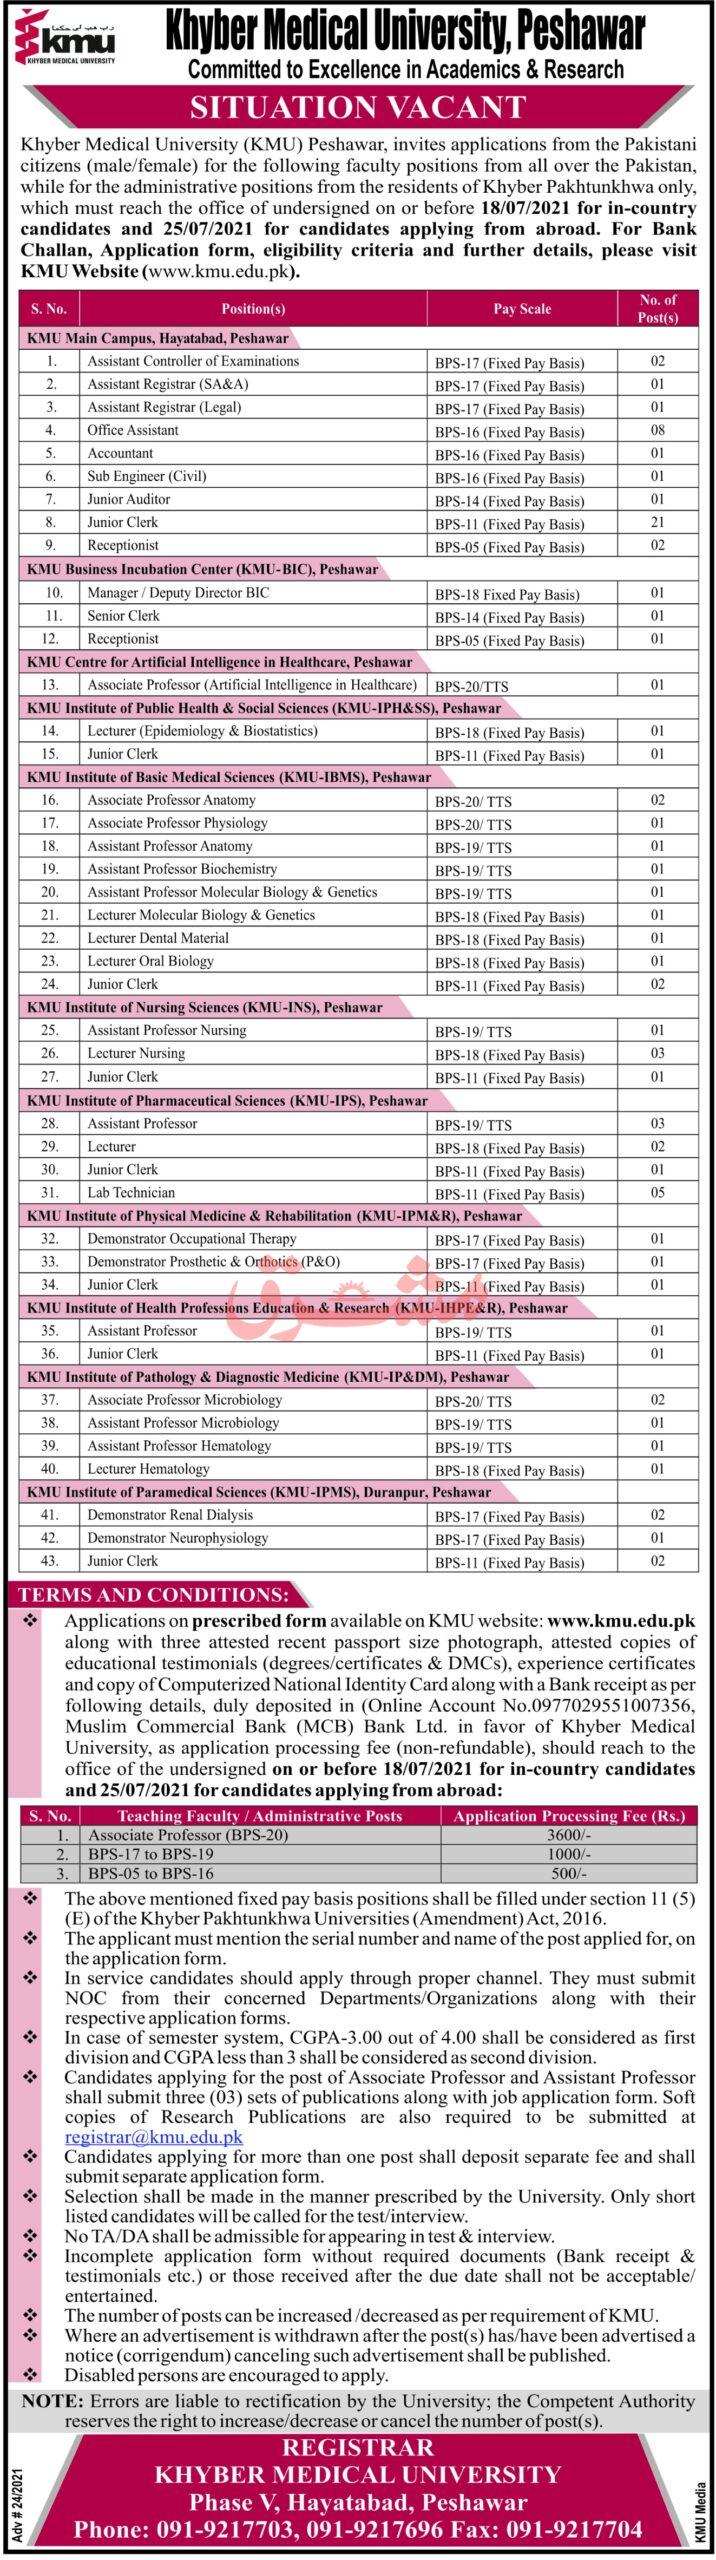 Khyber Medical University KMU Peshawar Jobs June 2021 Application Form